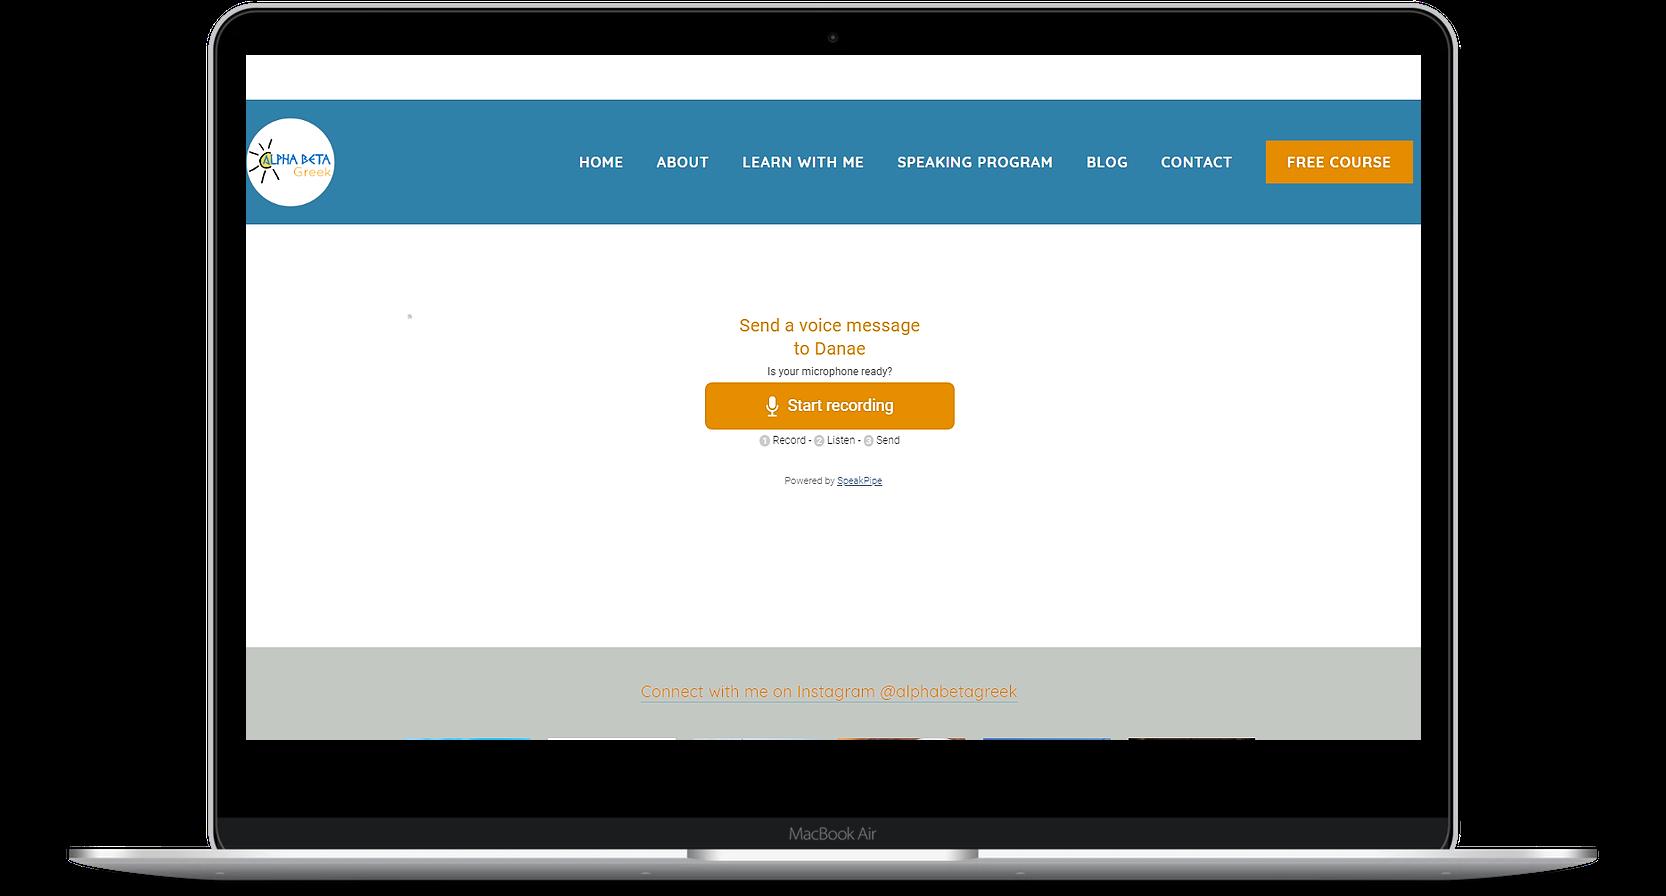 Greek lessons online_speaking and feedback program_alphabetagreek